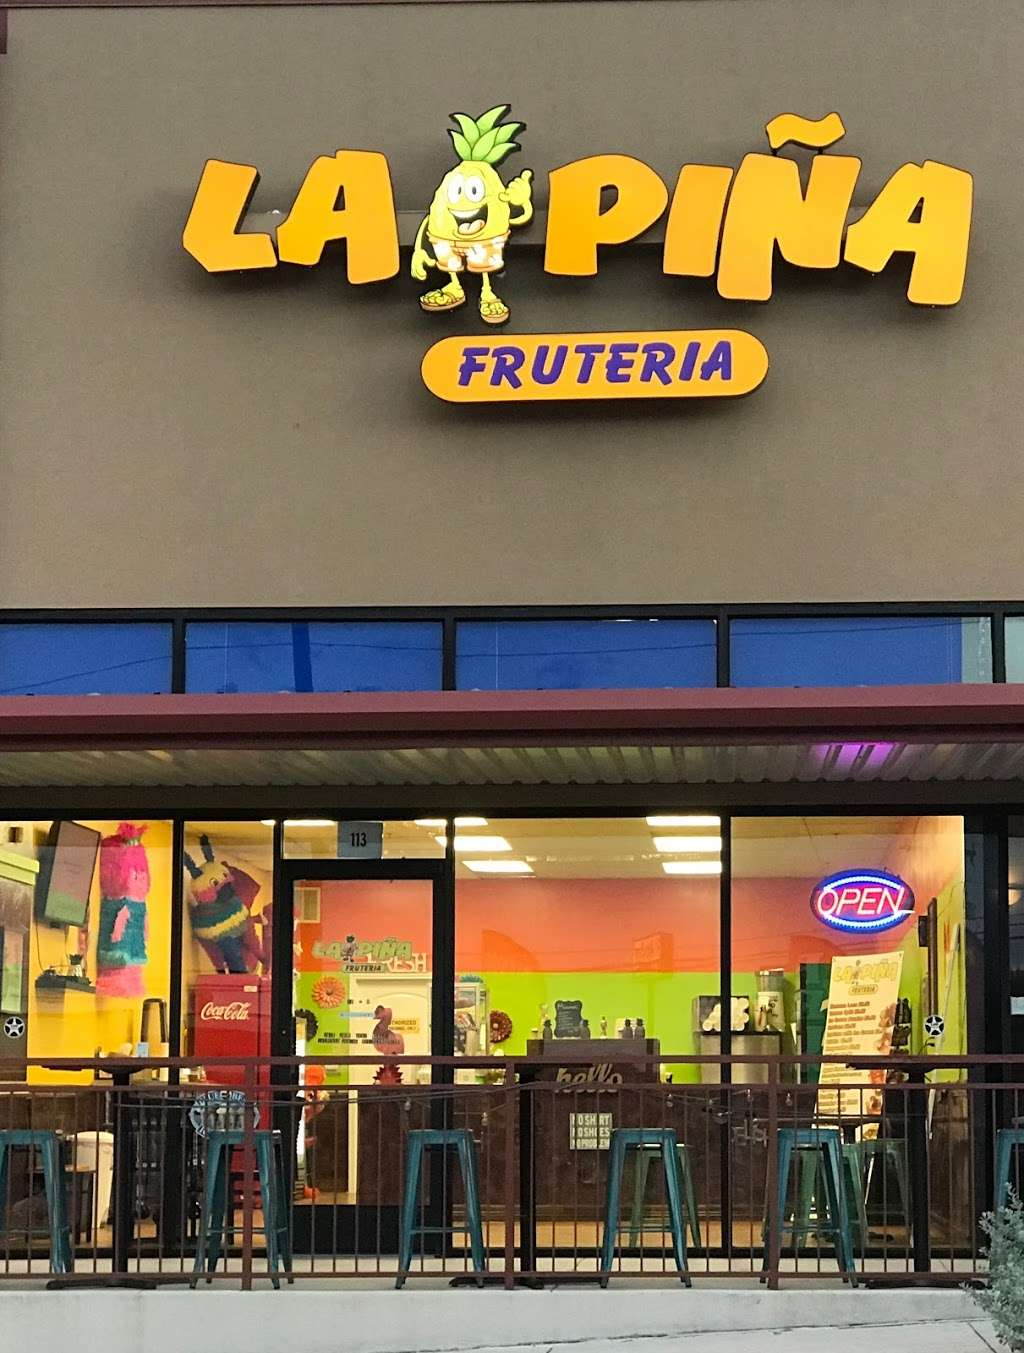 La Pina Fruteria - cafe    Photo 1 of 9   Address: 9902 Potranco Rd, San Antonio, TX 78251, USA   Phone: (210) 281-4573